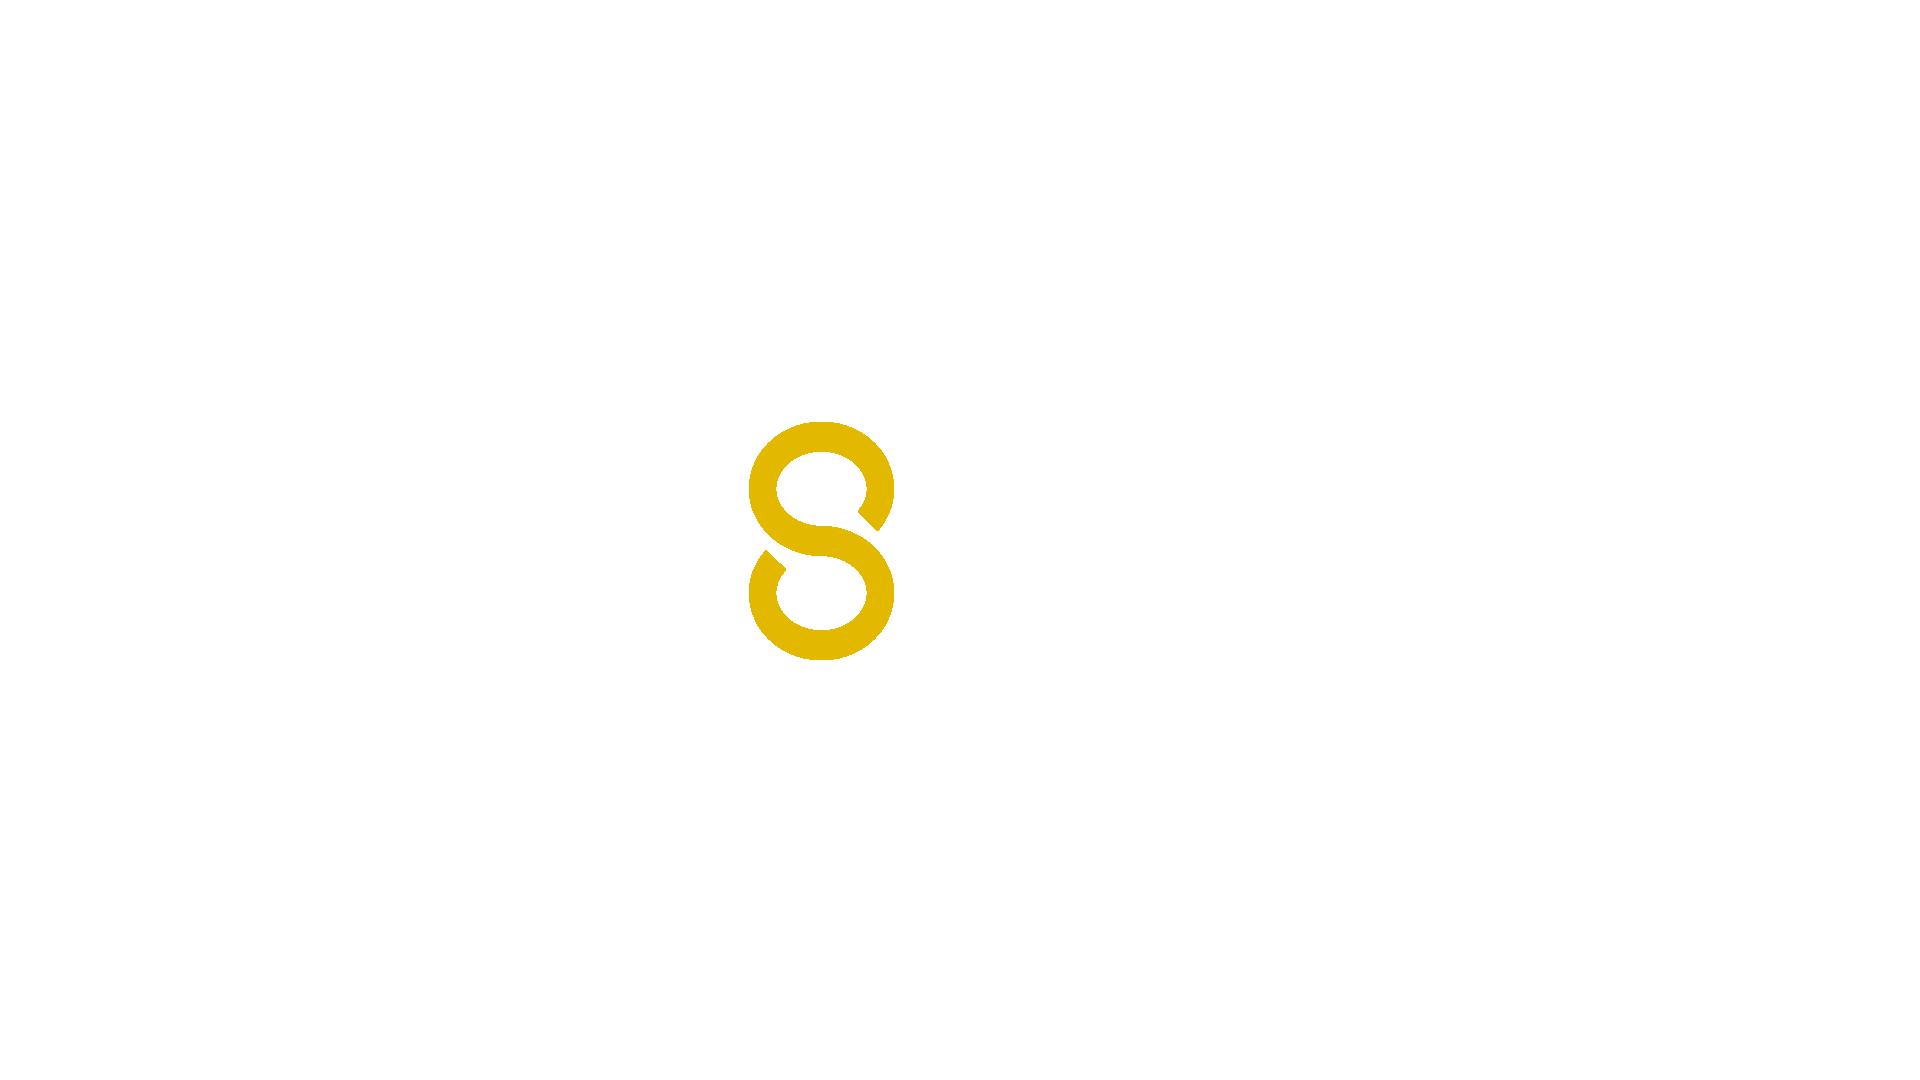 iniestazo